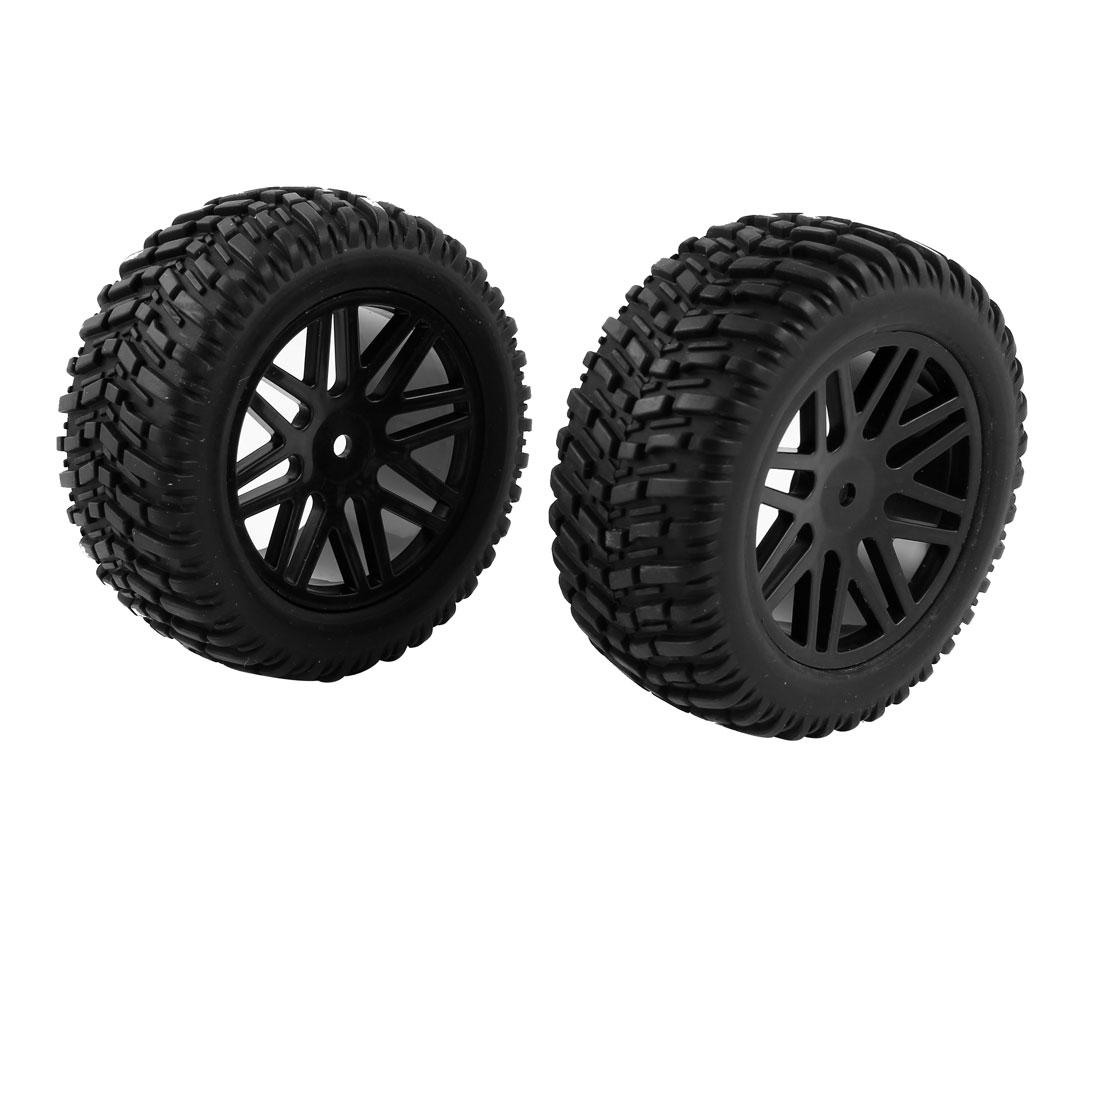 2 Pcs 15502 1/10 Scale RC Off Road Truck Casr Wheels Rims Tyres Black